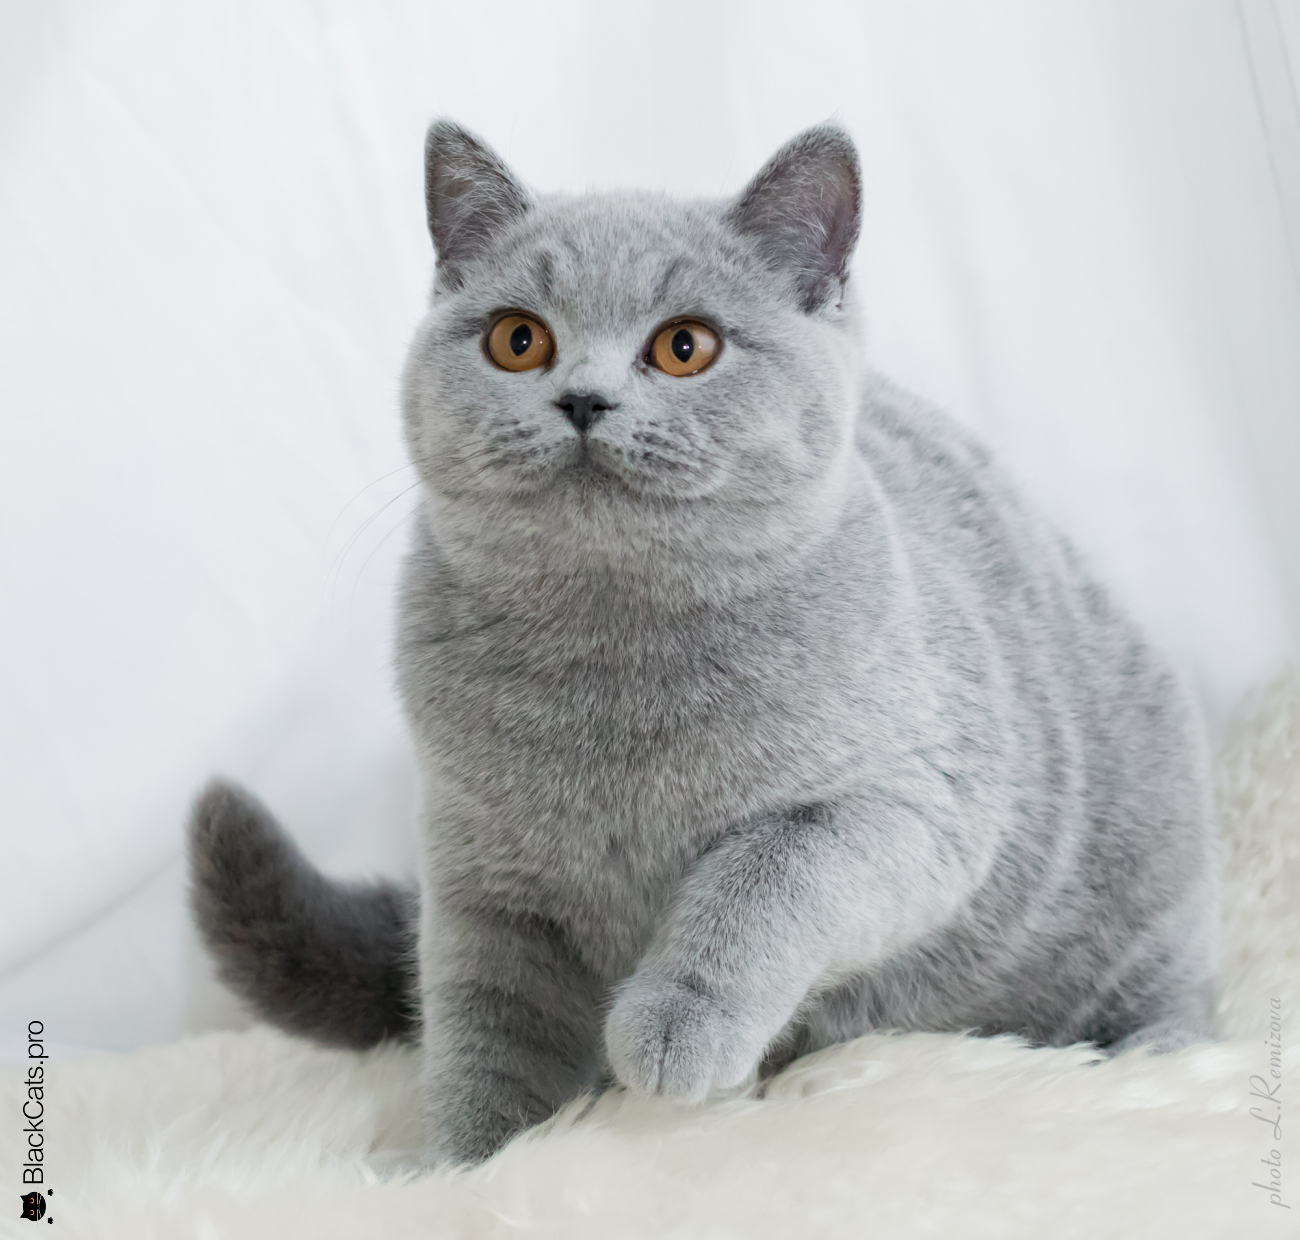 Izuminka Beauty Princess Jetstone 6 months